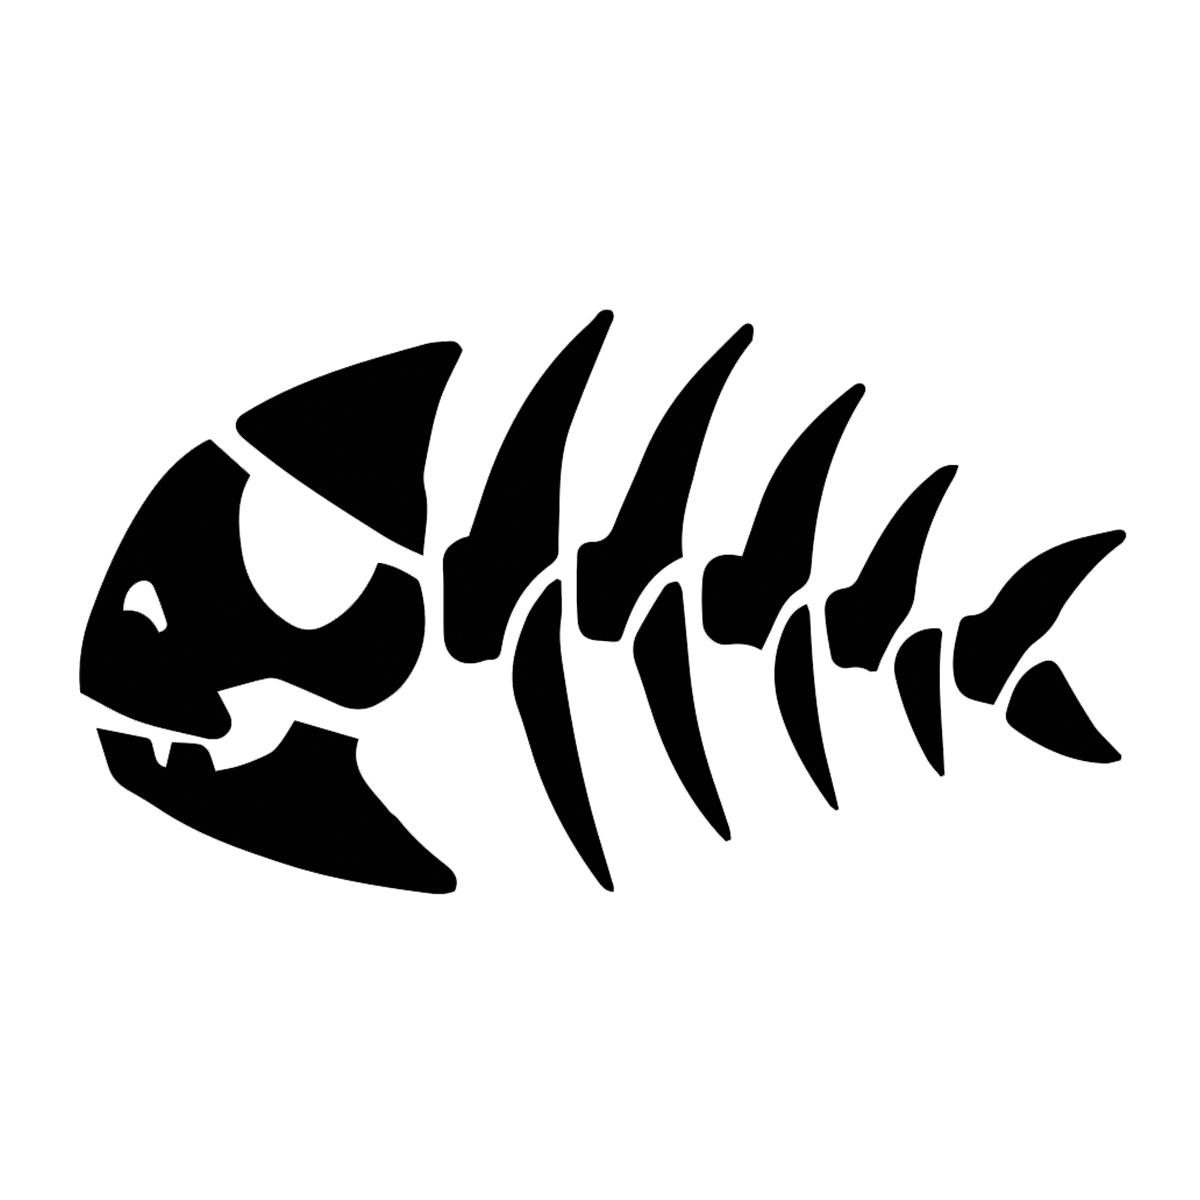 Fsm Jolly Pirate Fish Vinyl Decal